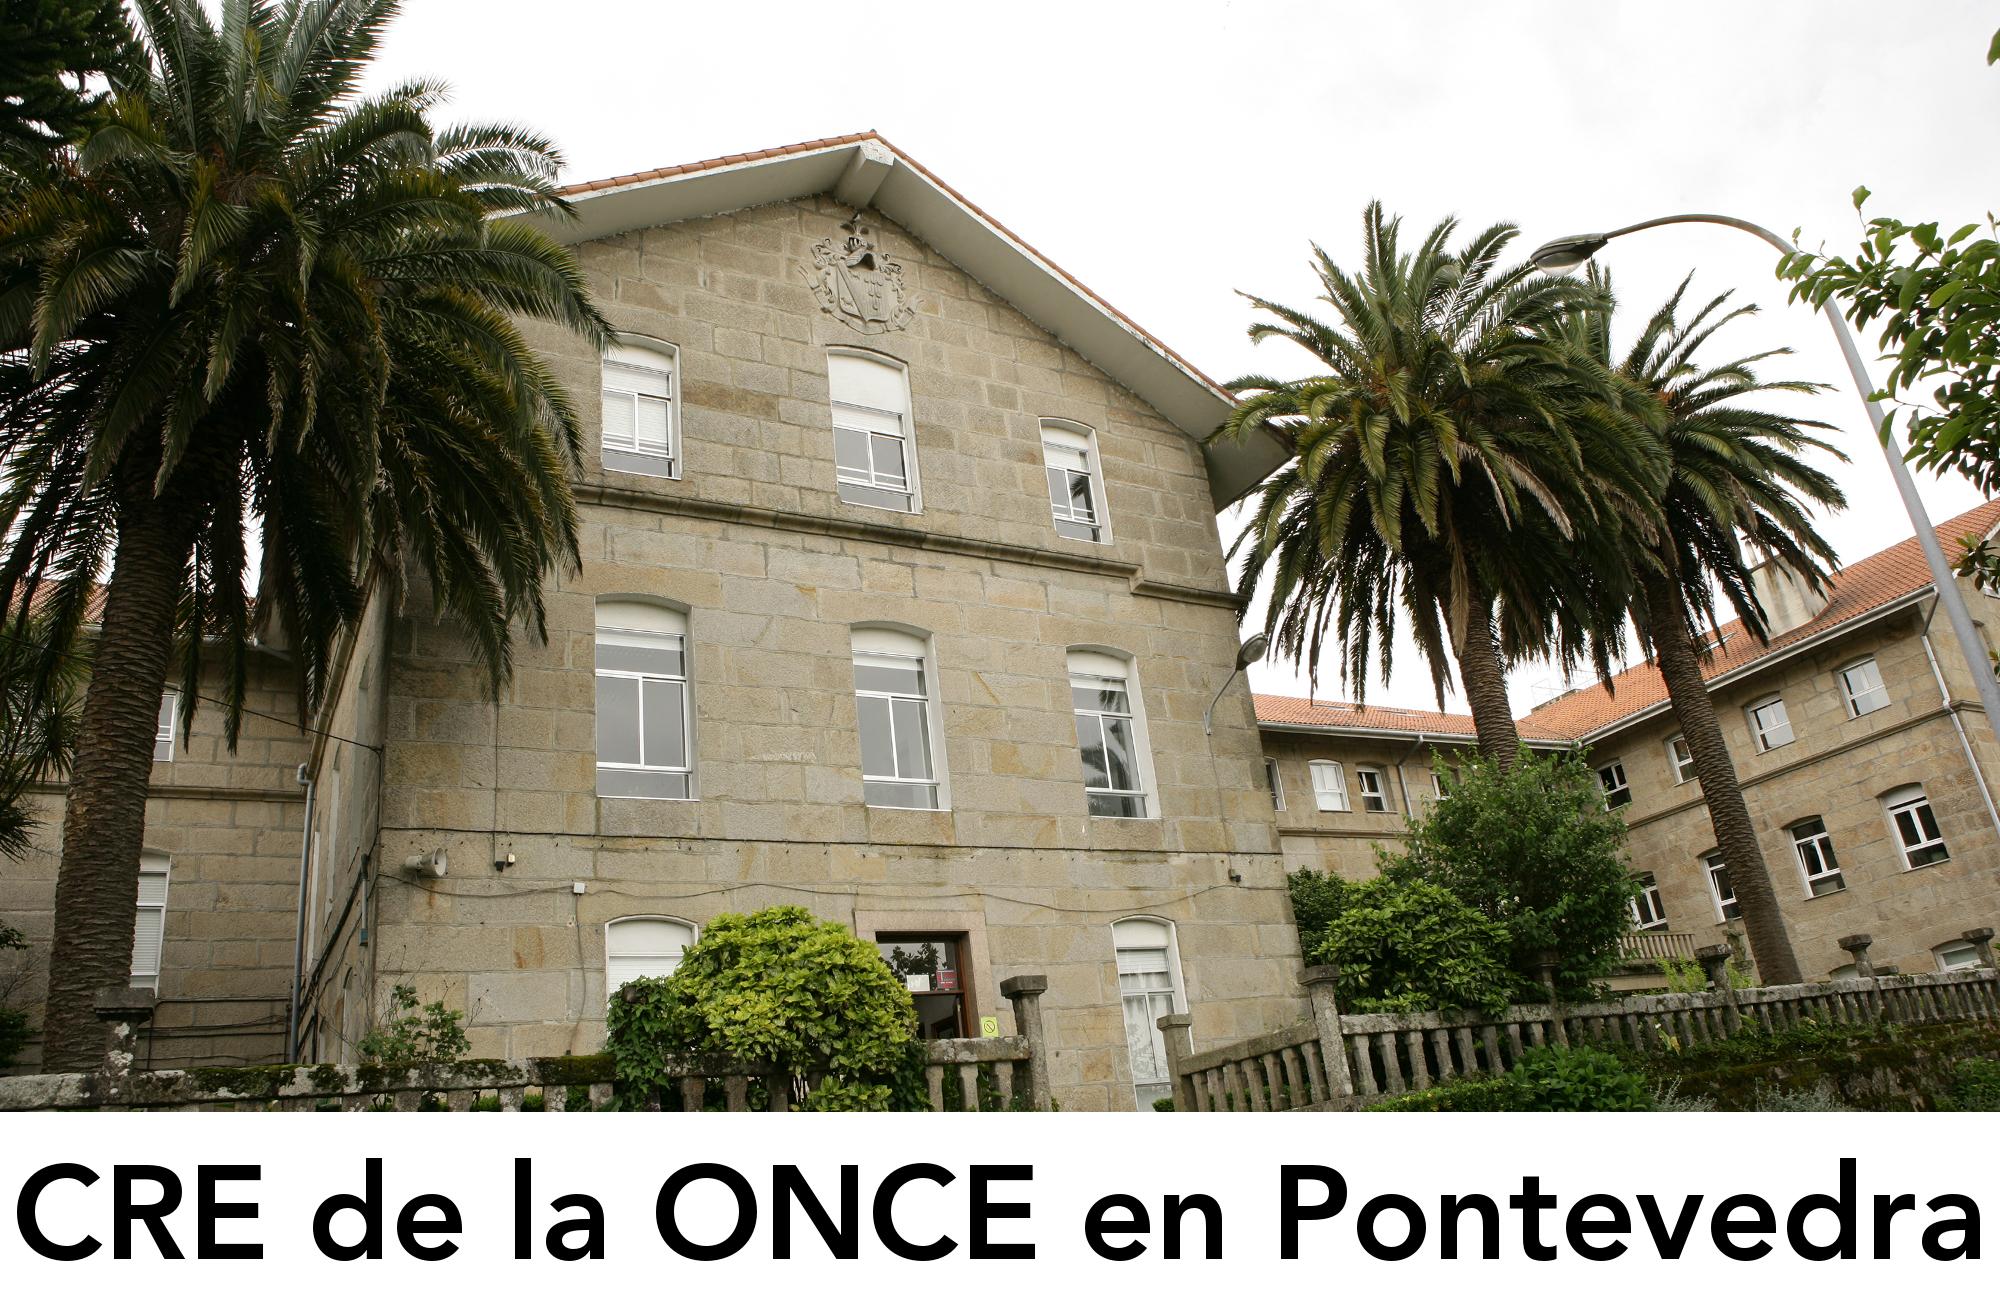 CRE de la ONCE en Pontevedra